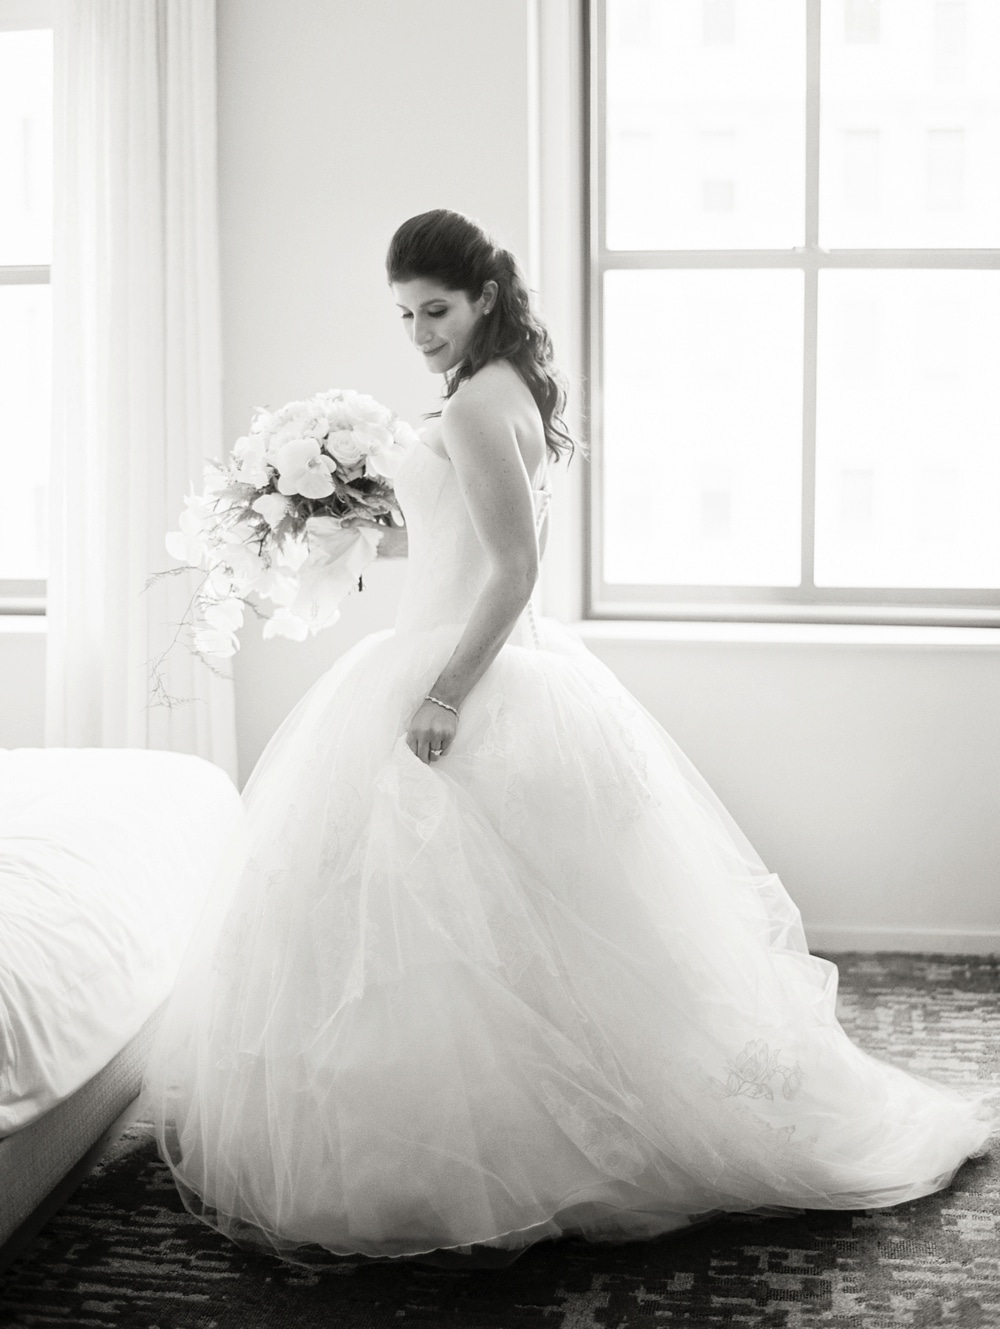 kristin-la-voie-photography-Cincinnati-Music-Hall-Wedding-36